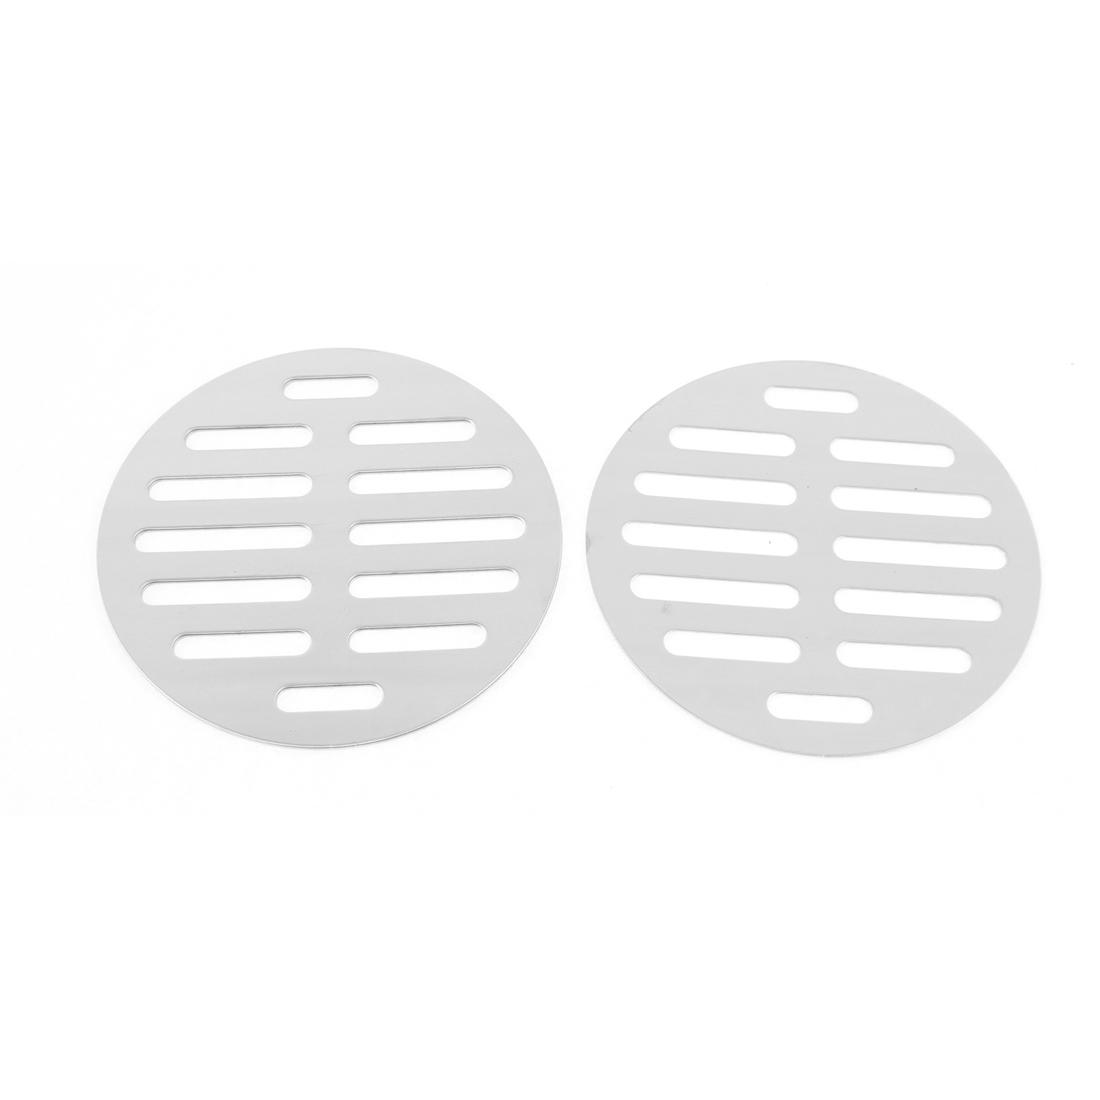 "Stainless Steel Kitchen Bathroom Round Floor Drain Cover 4"" 10cm 3pcs"